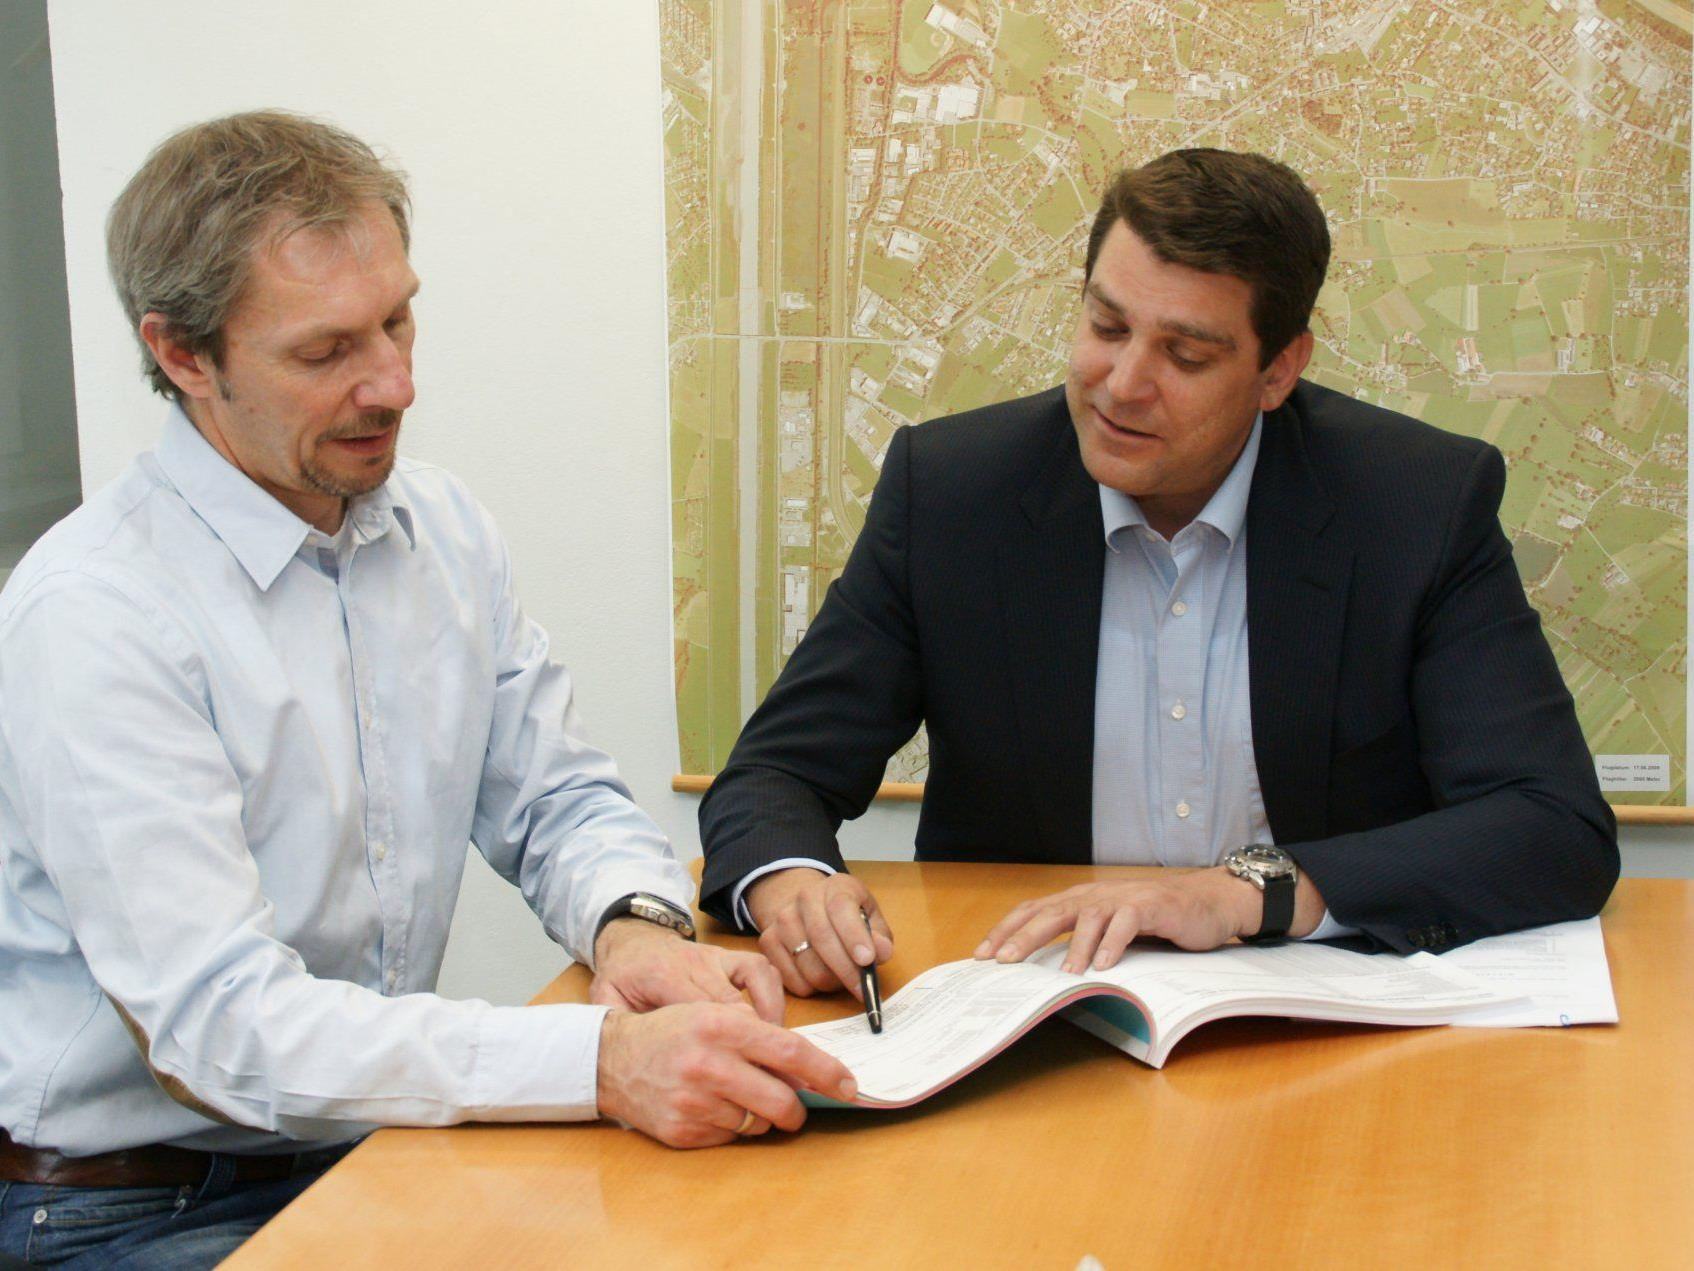 Finanzreferen Franz Bereuter und Bgm. Harald Köhlmeier legten den Rechnungsabschluss 2011 vor.